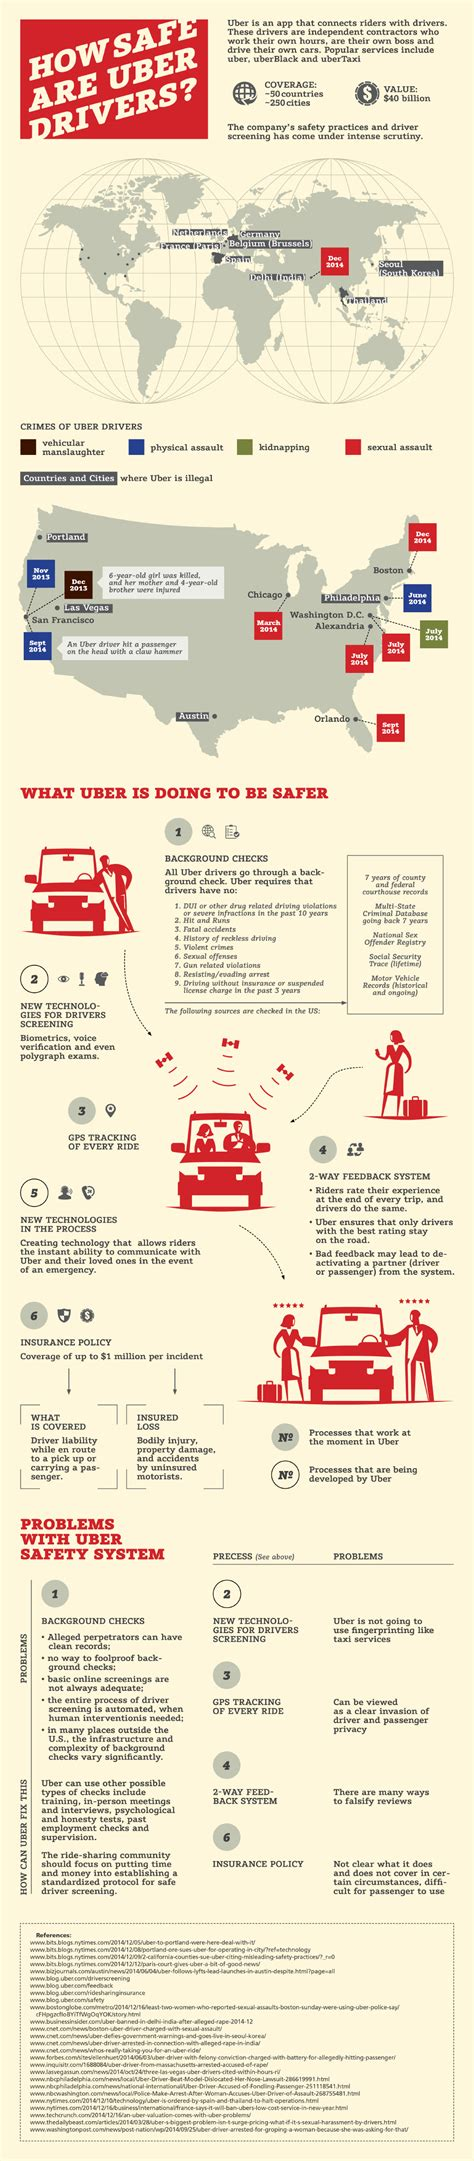 Does Uber Background Check How Safe Is Uber